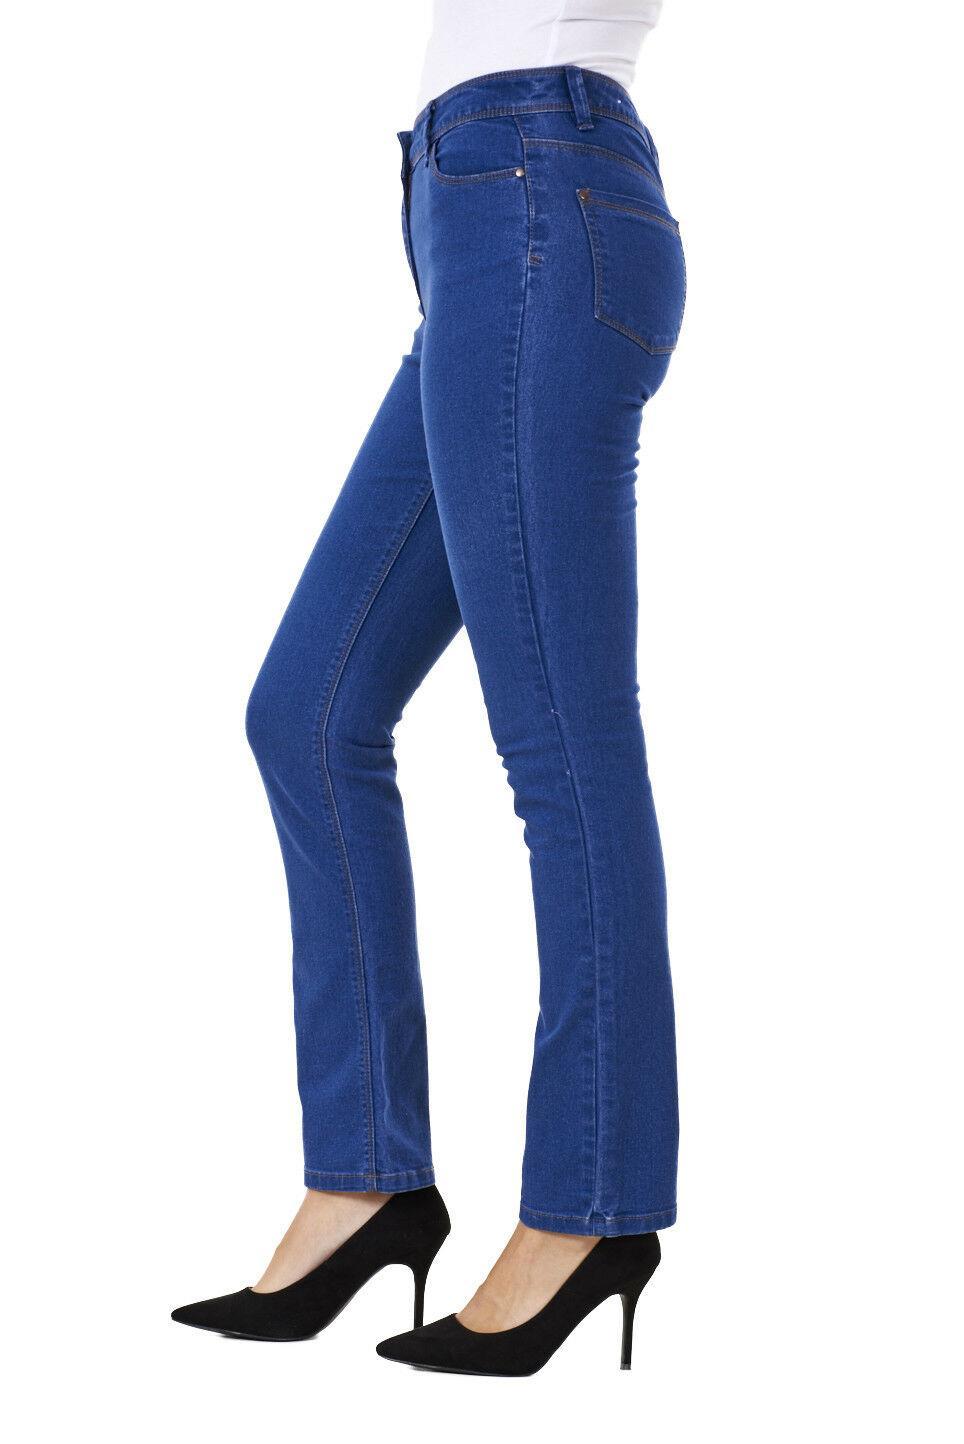 Ladies-Straight-Leg-Denim-Womens-Pants-Stretch-Regular-Fit-Jeans thumbnail 11